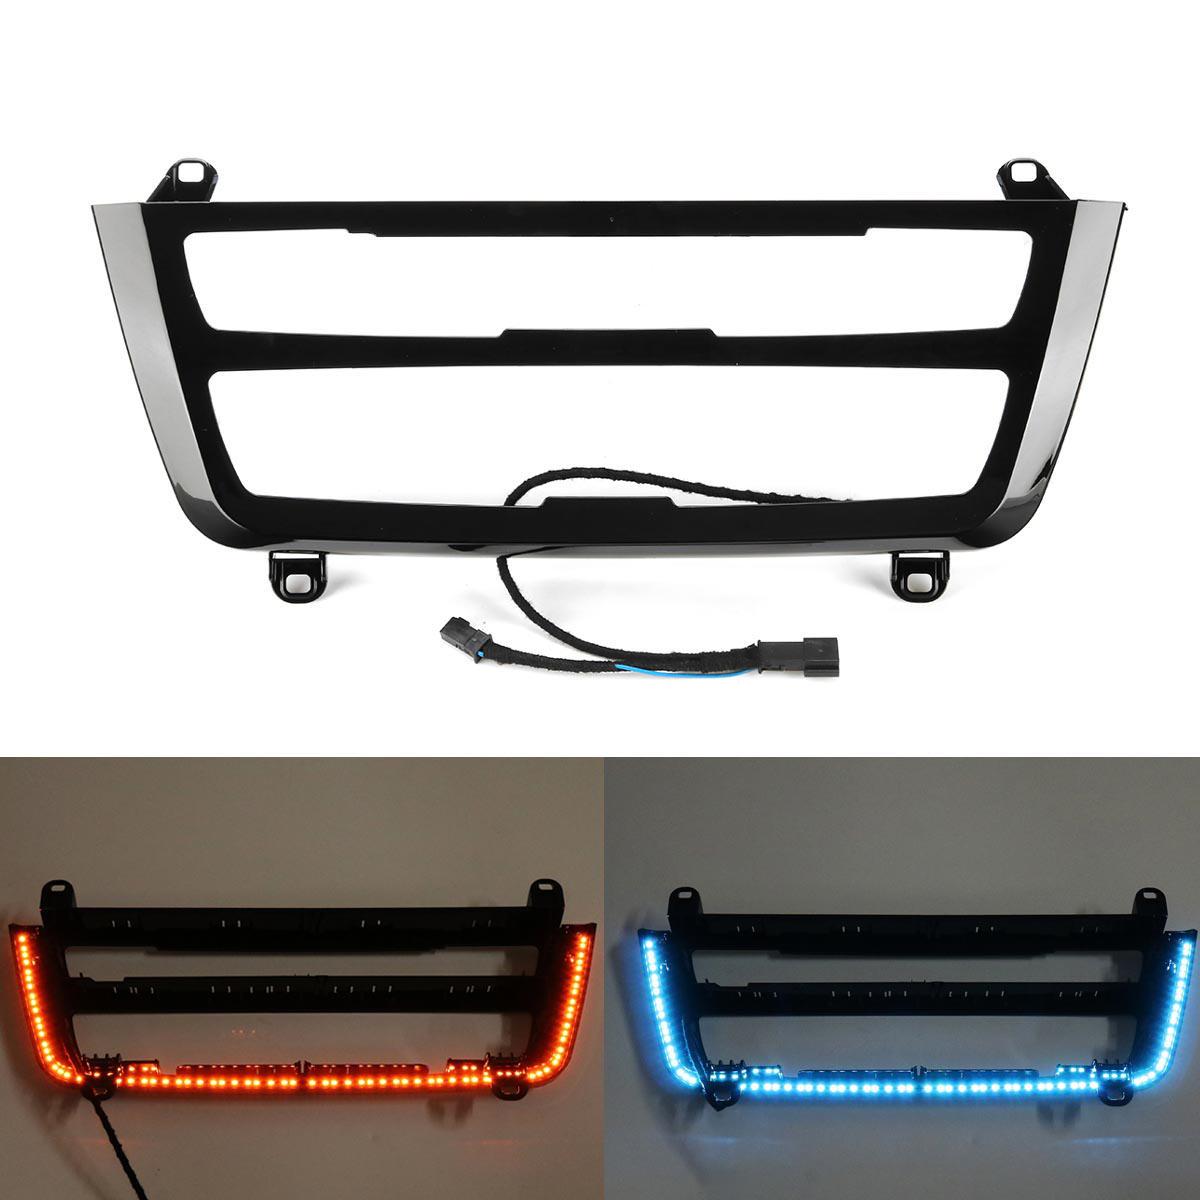 Illuminated LED Dual Color AC Radio Trim Retrofit For BMW 3 4 M3 M4 Series F30 F31 F32 F33 F34 F36 F80 F82 F83